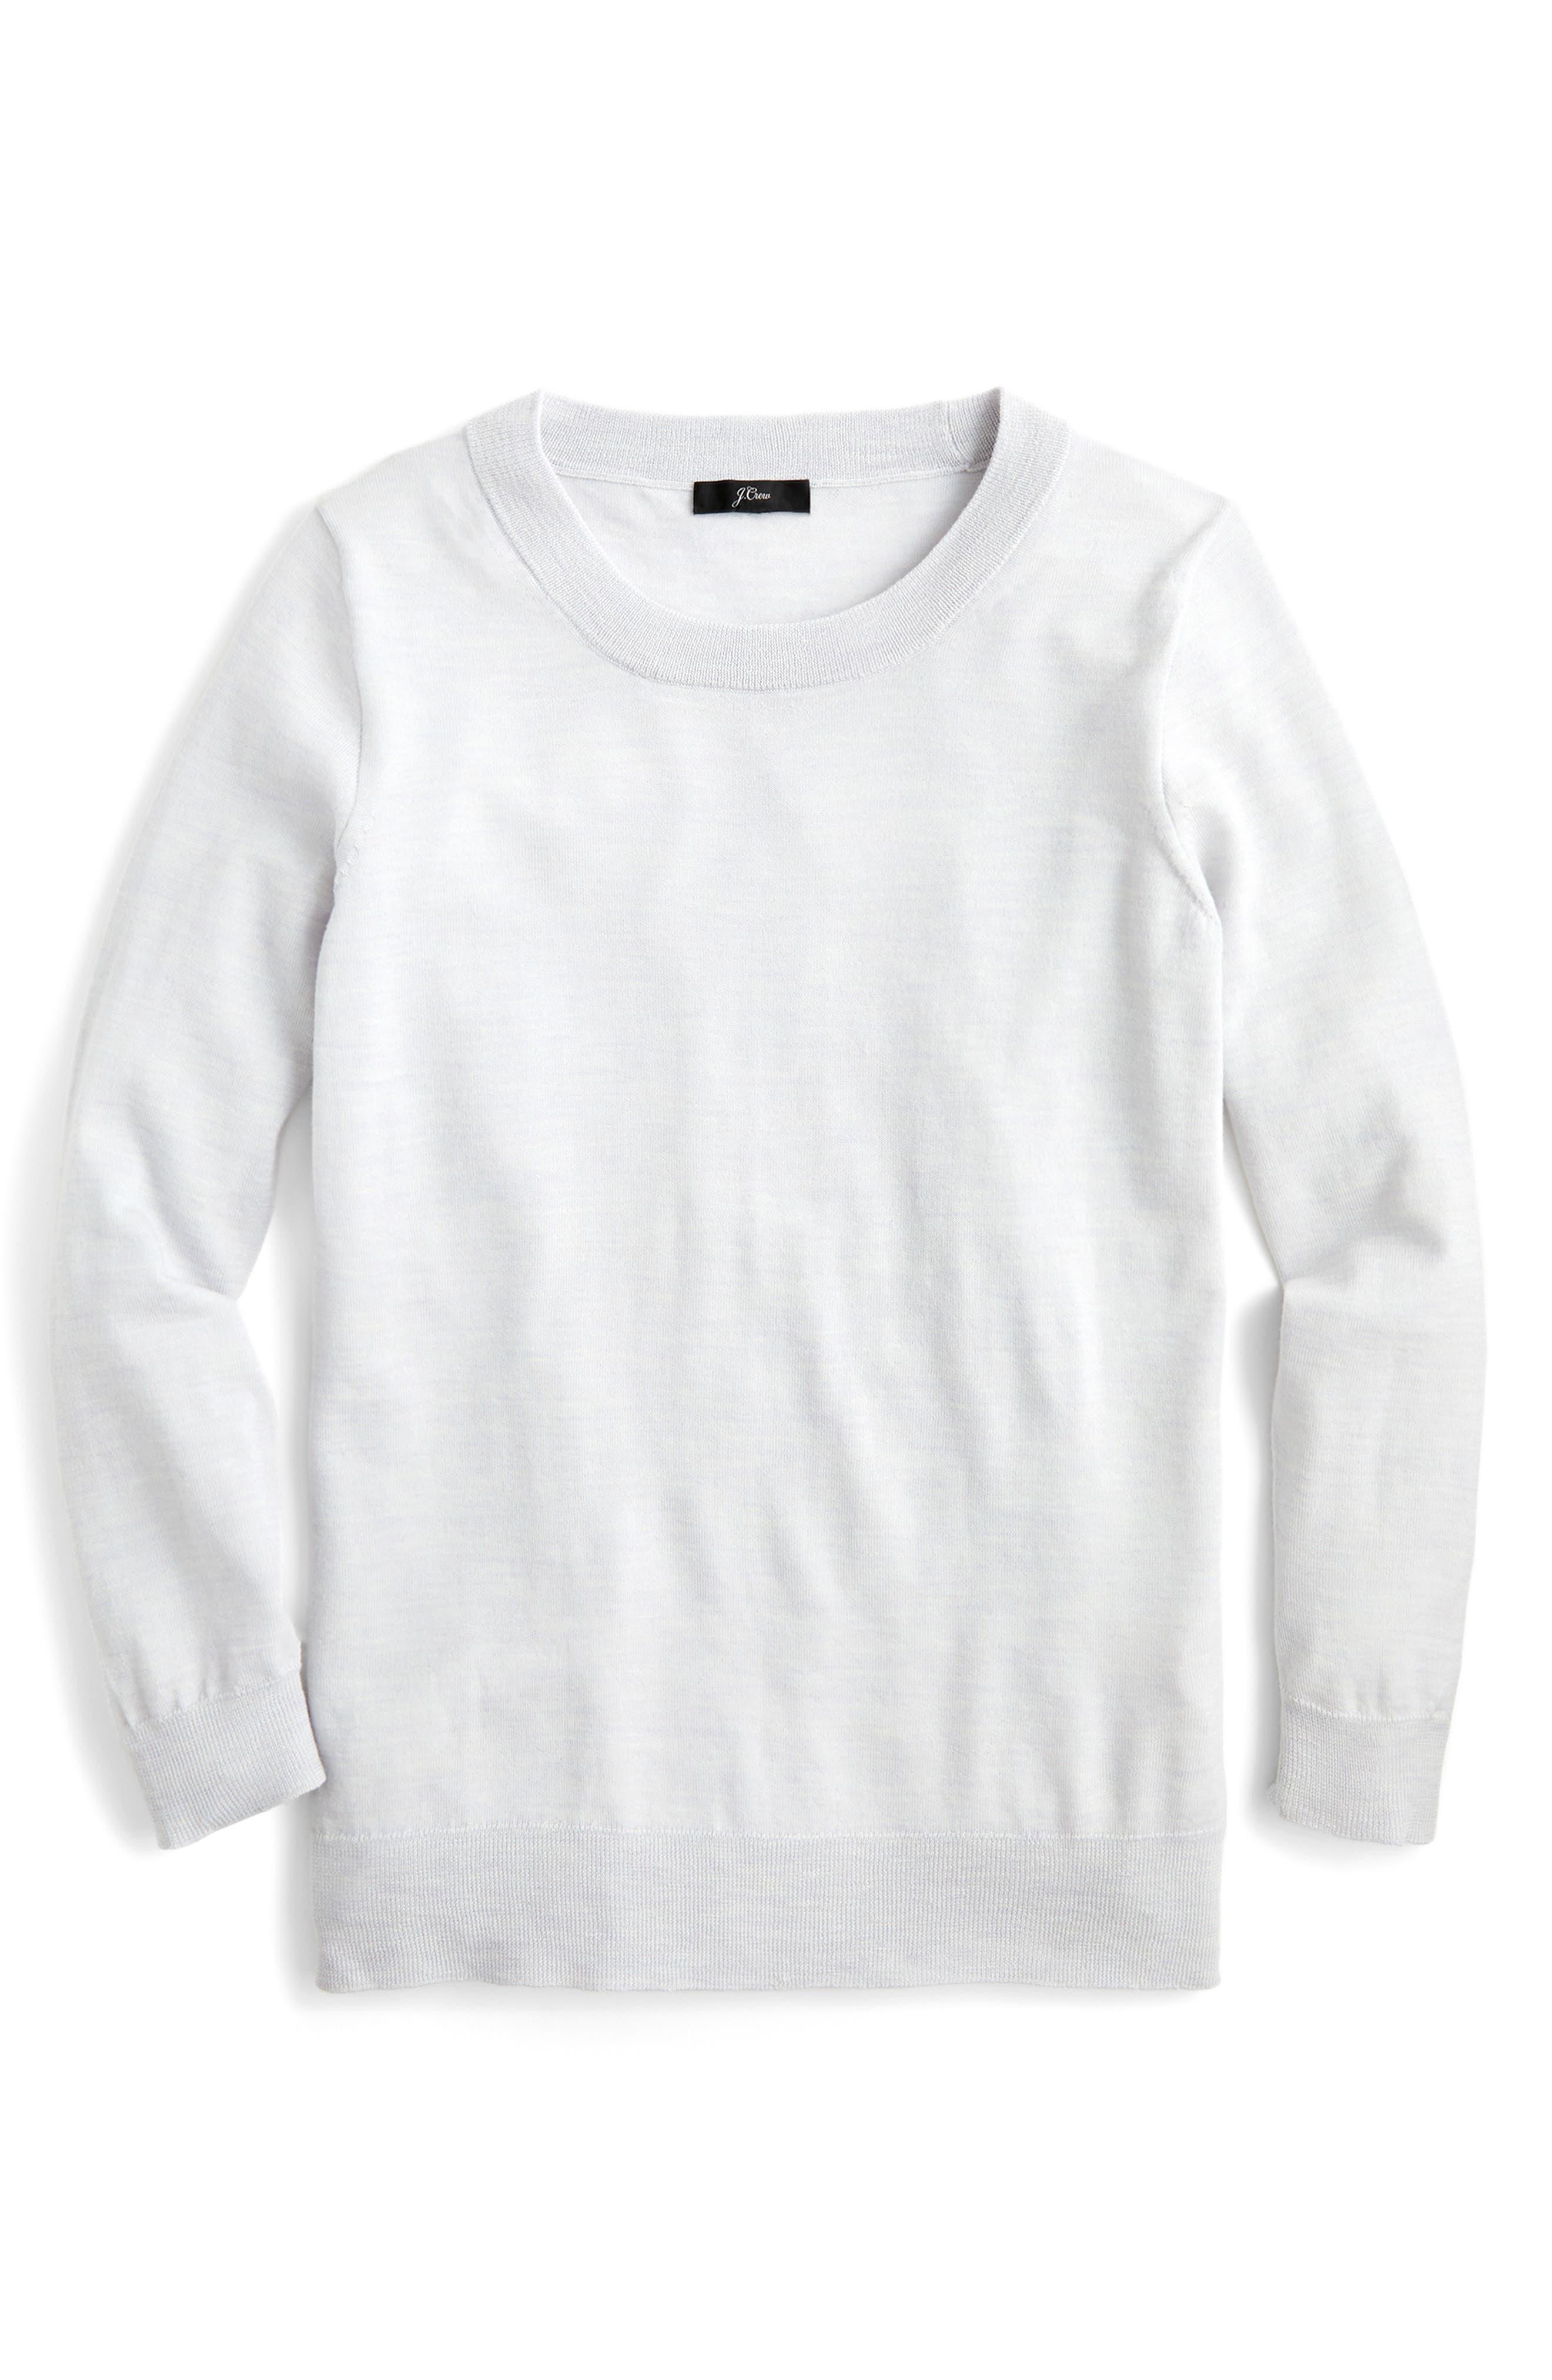 Plus Size J.crew Tippi Merino Wool Sweater, Size - Grey